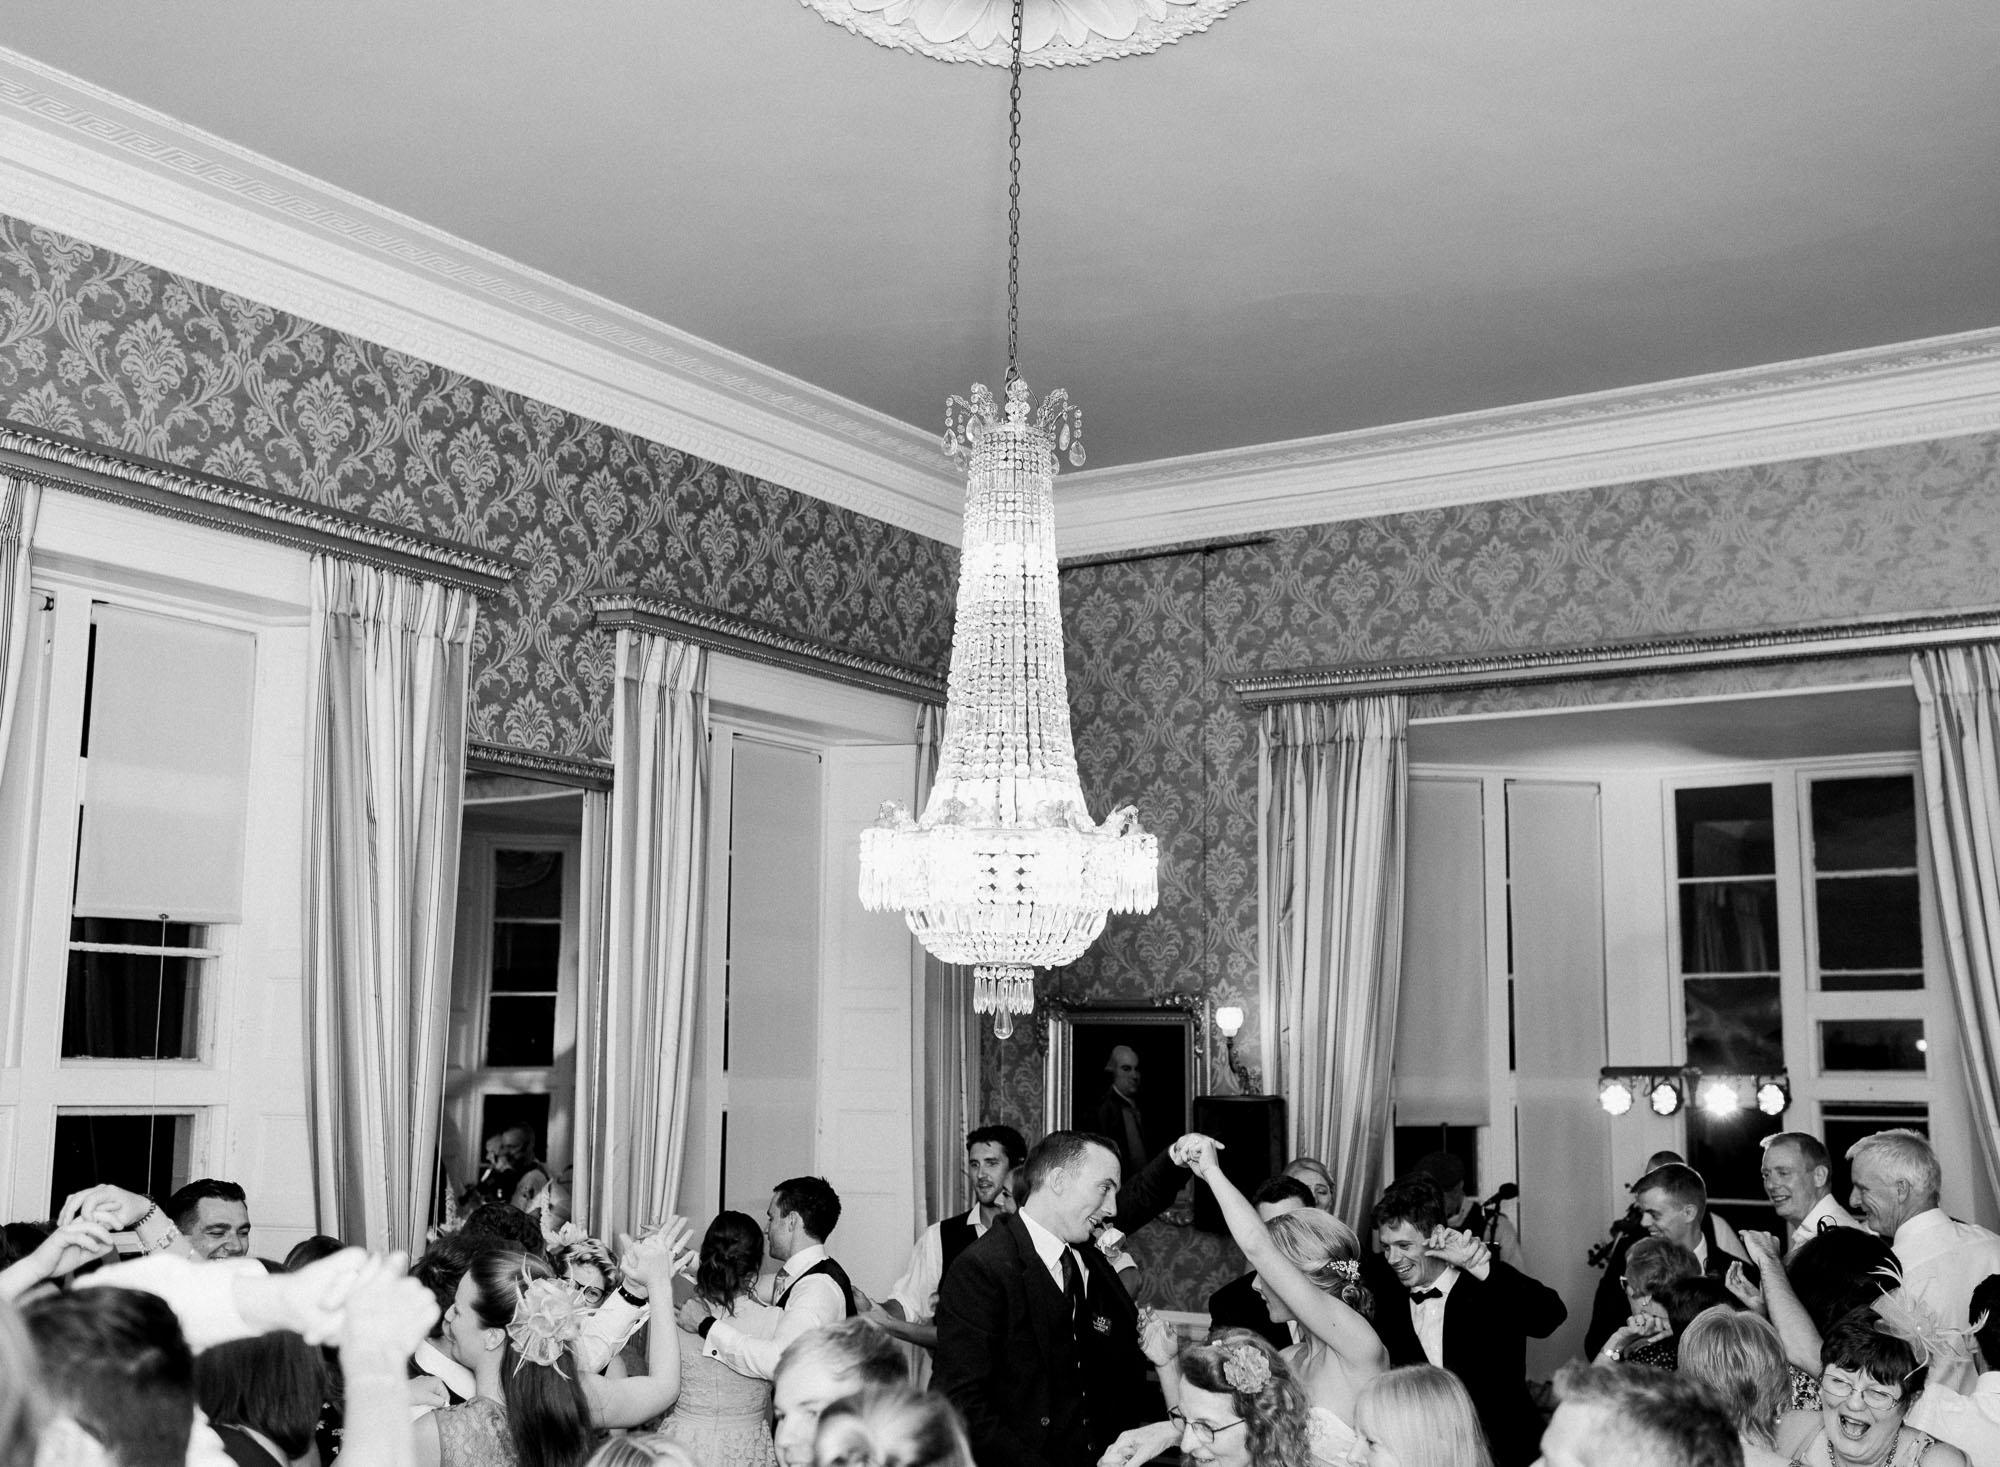 scottish_wedding_blairquhan_castle-106.jpg